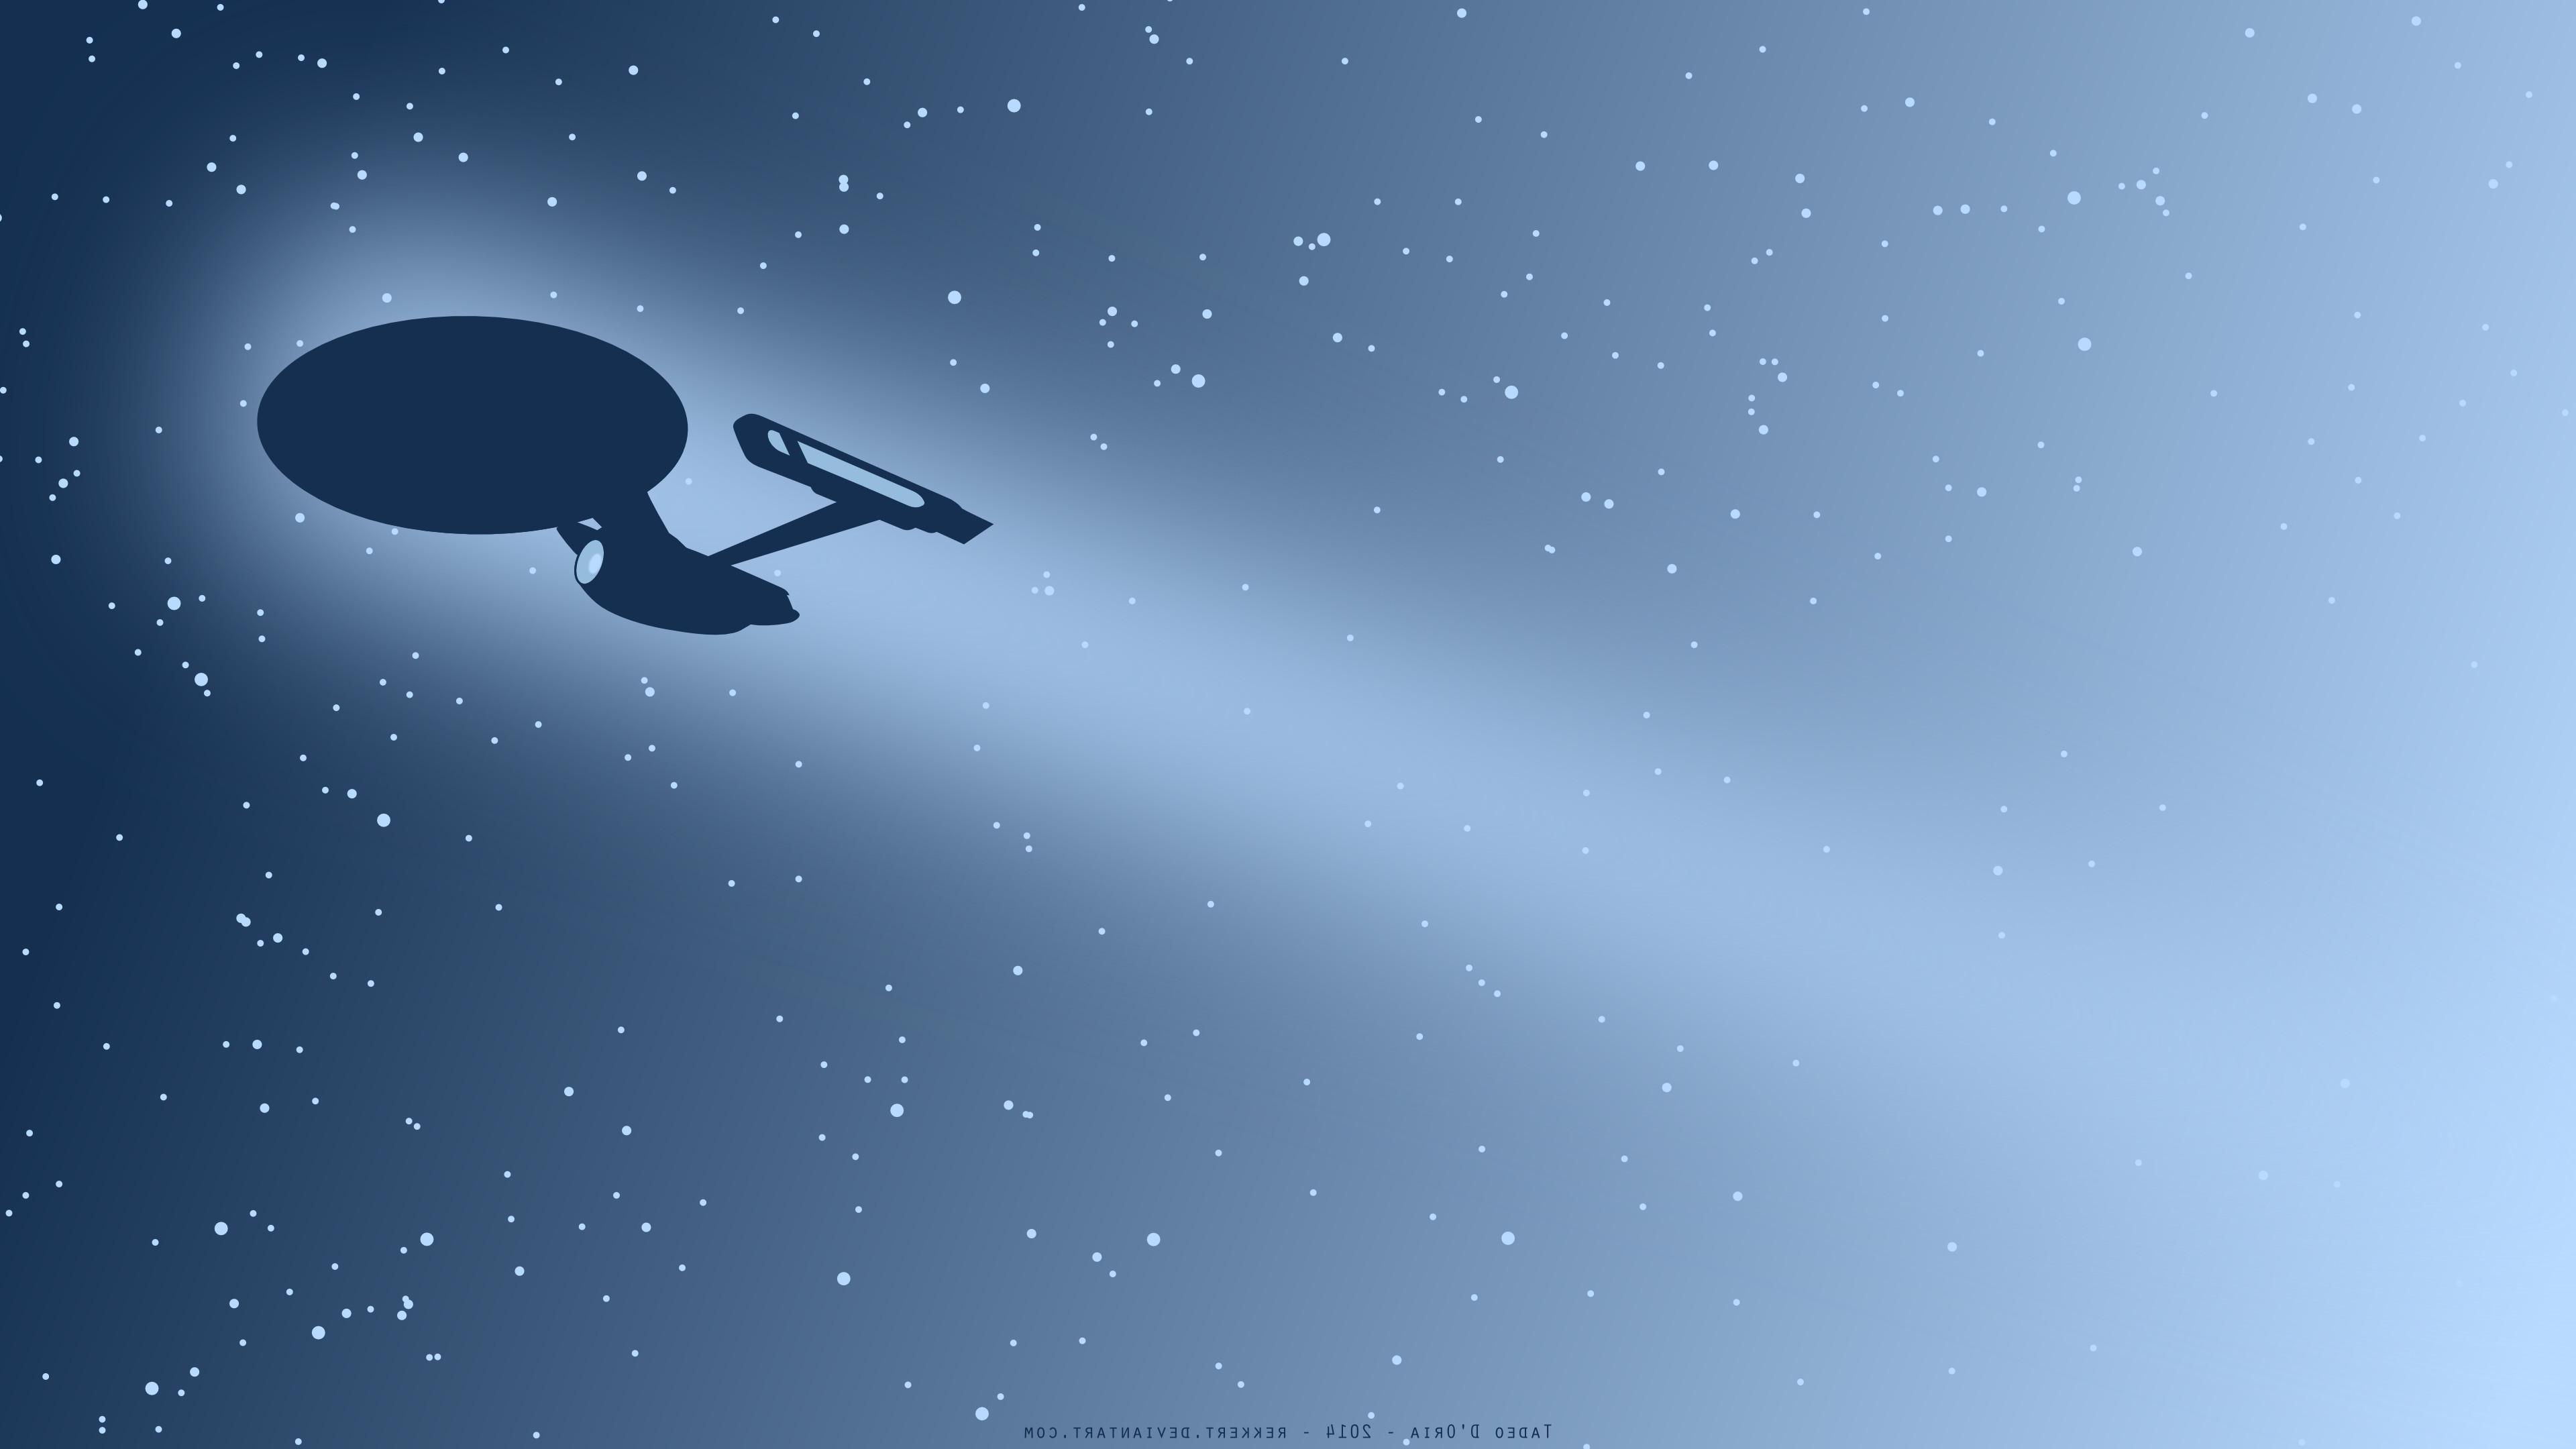 Star Trek, USS Enterprise (spaceship), Minimalism, Space, Artwork